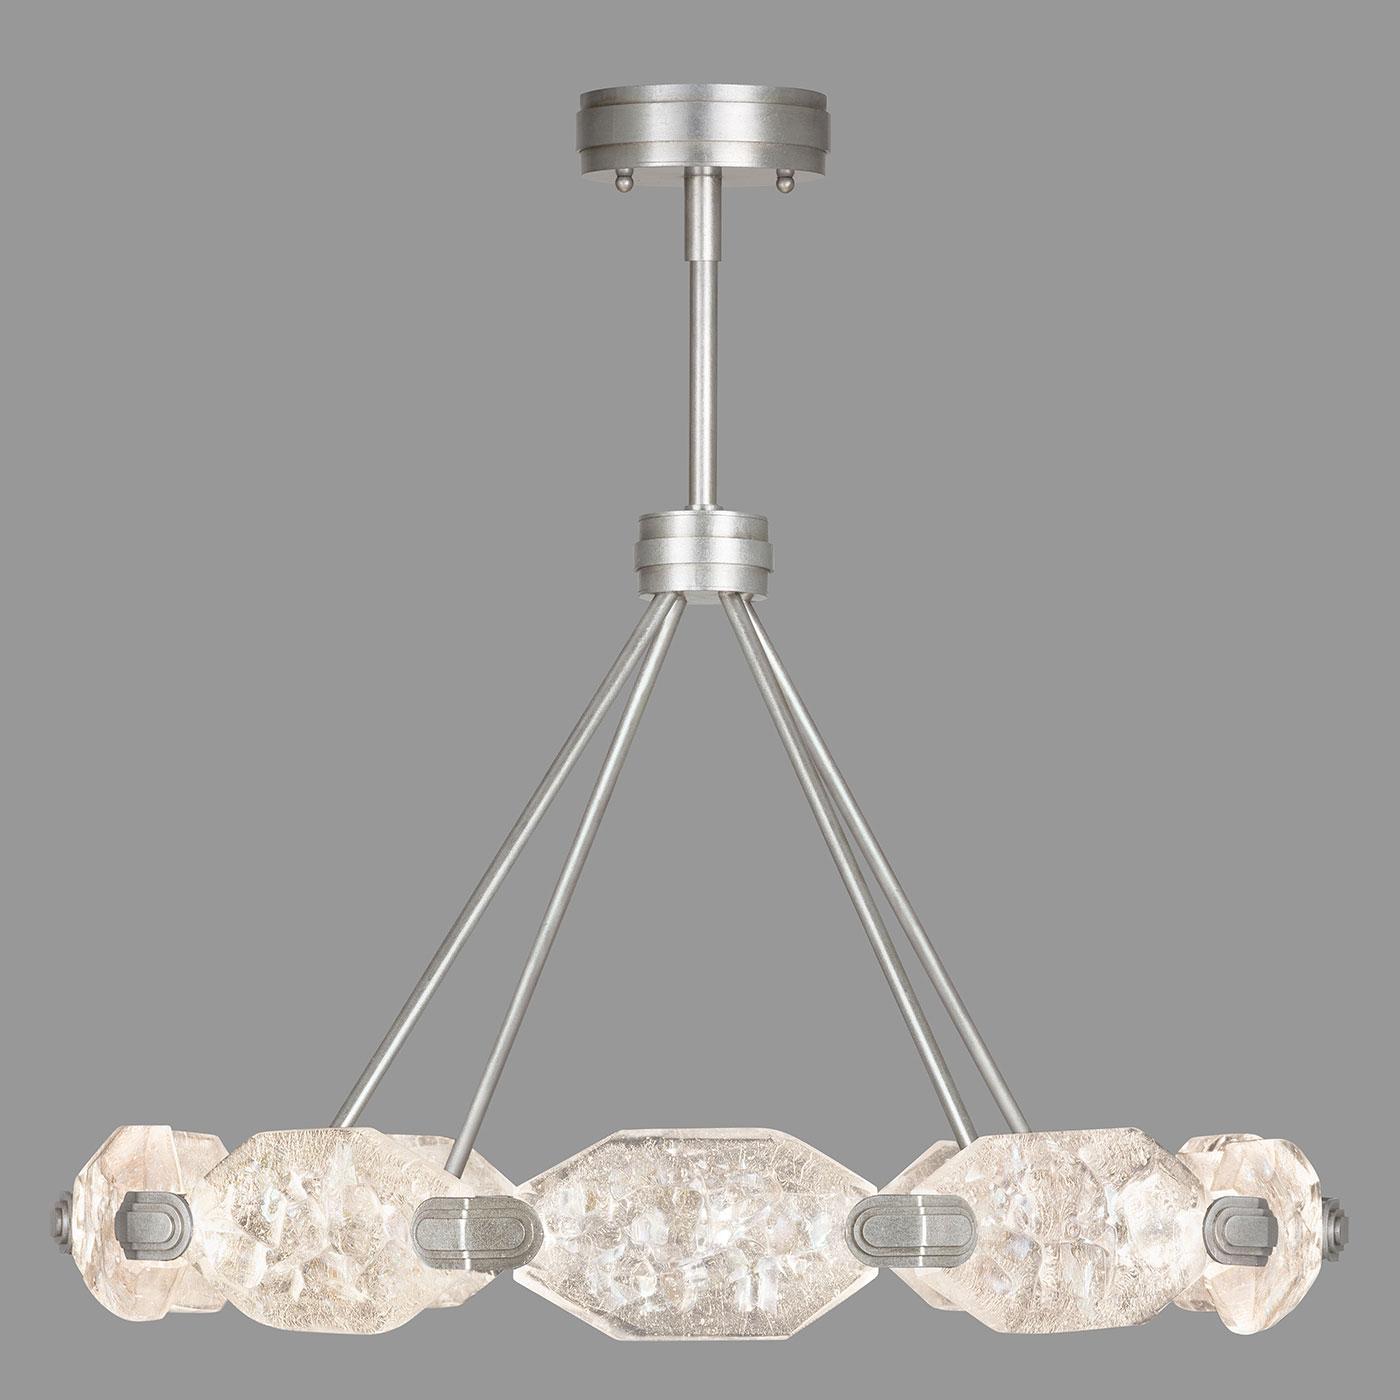 Allison Paladino Horizontal Gems Pendantfine Art Lamps   873040 1 With Paladino 6 Light Chandeliers (View 18 of 30)